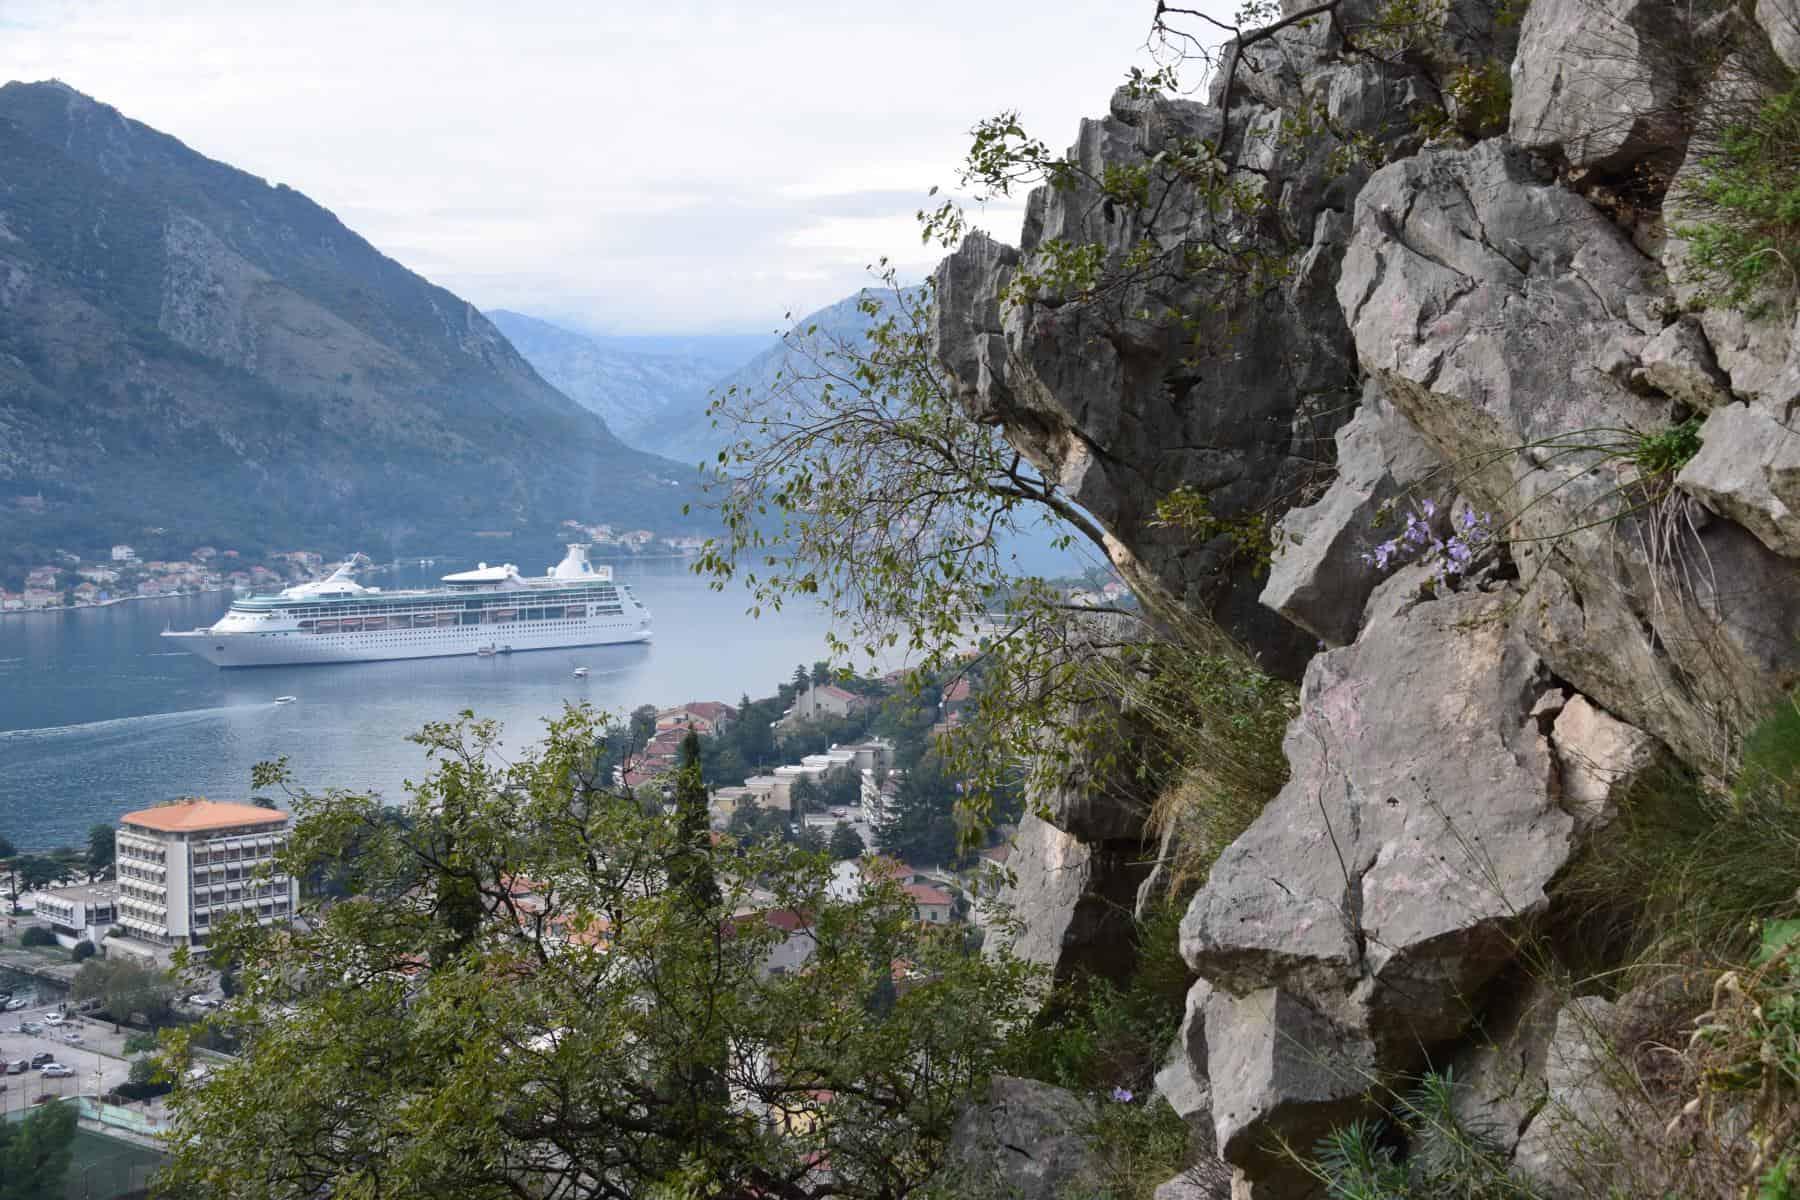 000 Kreuzfahrt oestliches Mittelmeer Royal Caribbean Vision of the Seas Kotor Montenegro